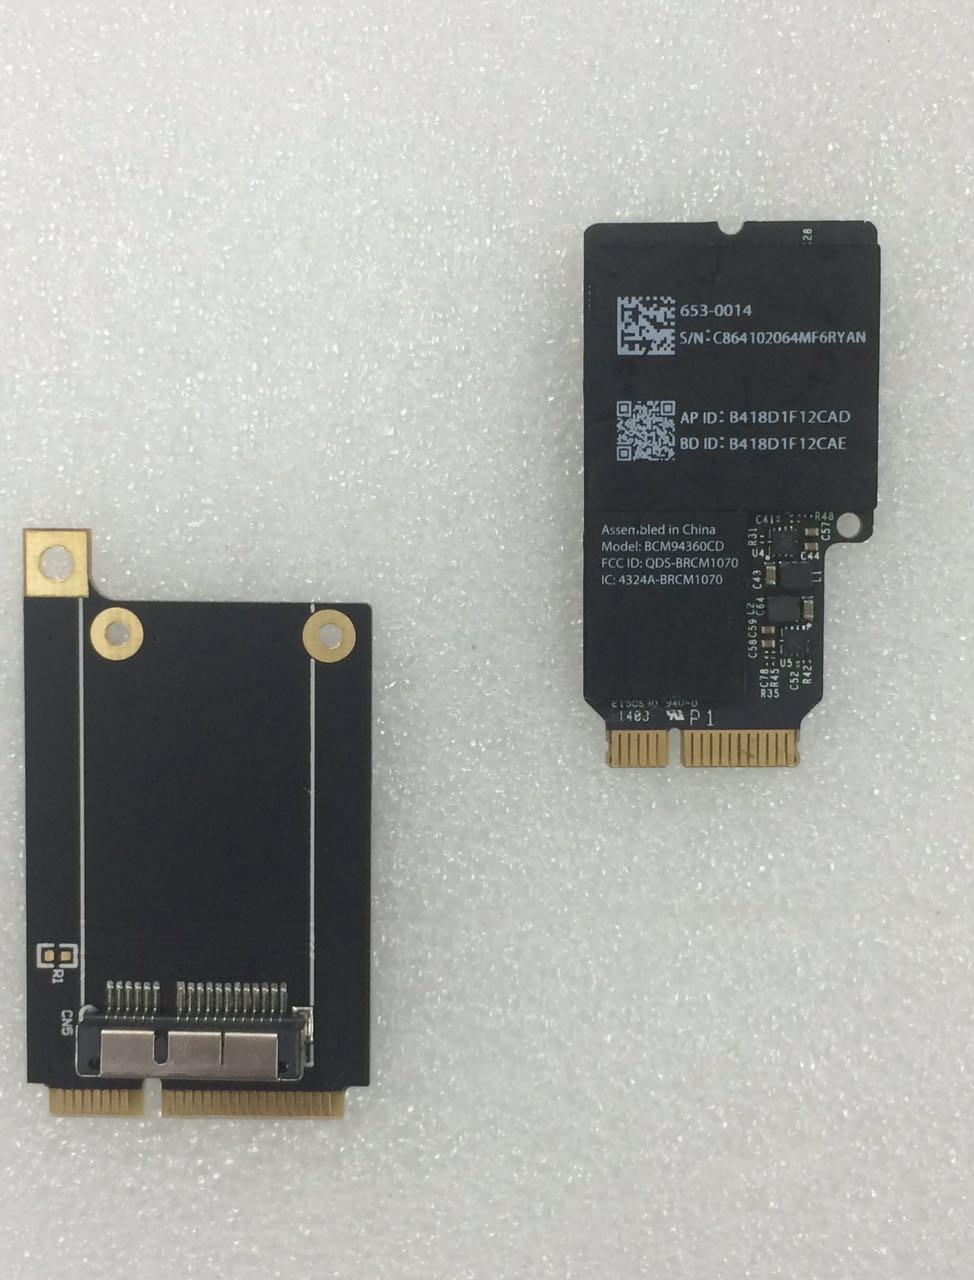 Broadcom BCM4360 BCM94360CD BCM94360CDAX + Mini adaptateur PCIe 802.11AC WIFI WLAN + carte bluetooth oth4.0